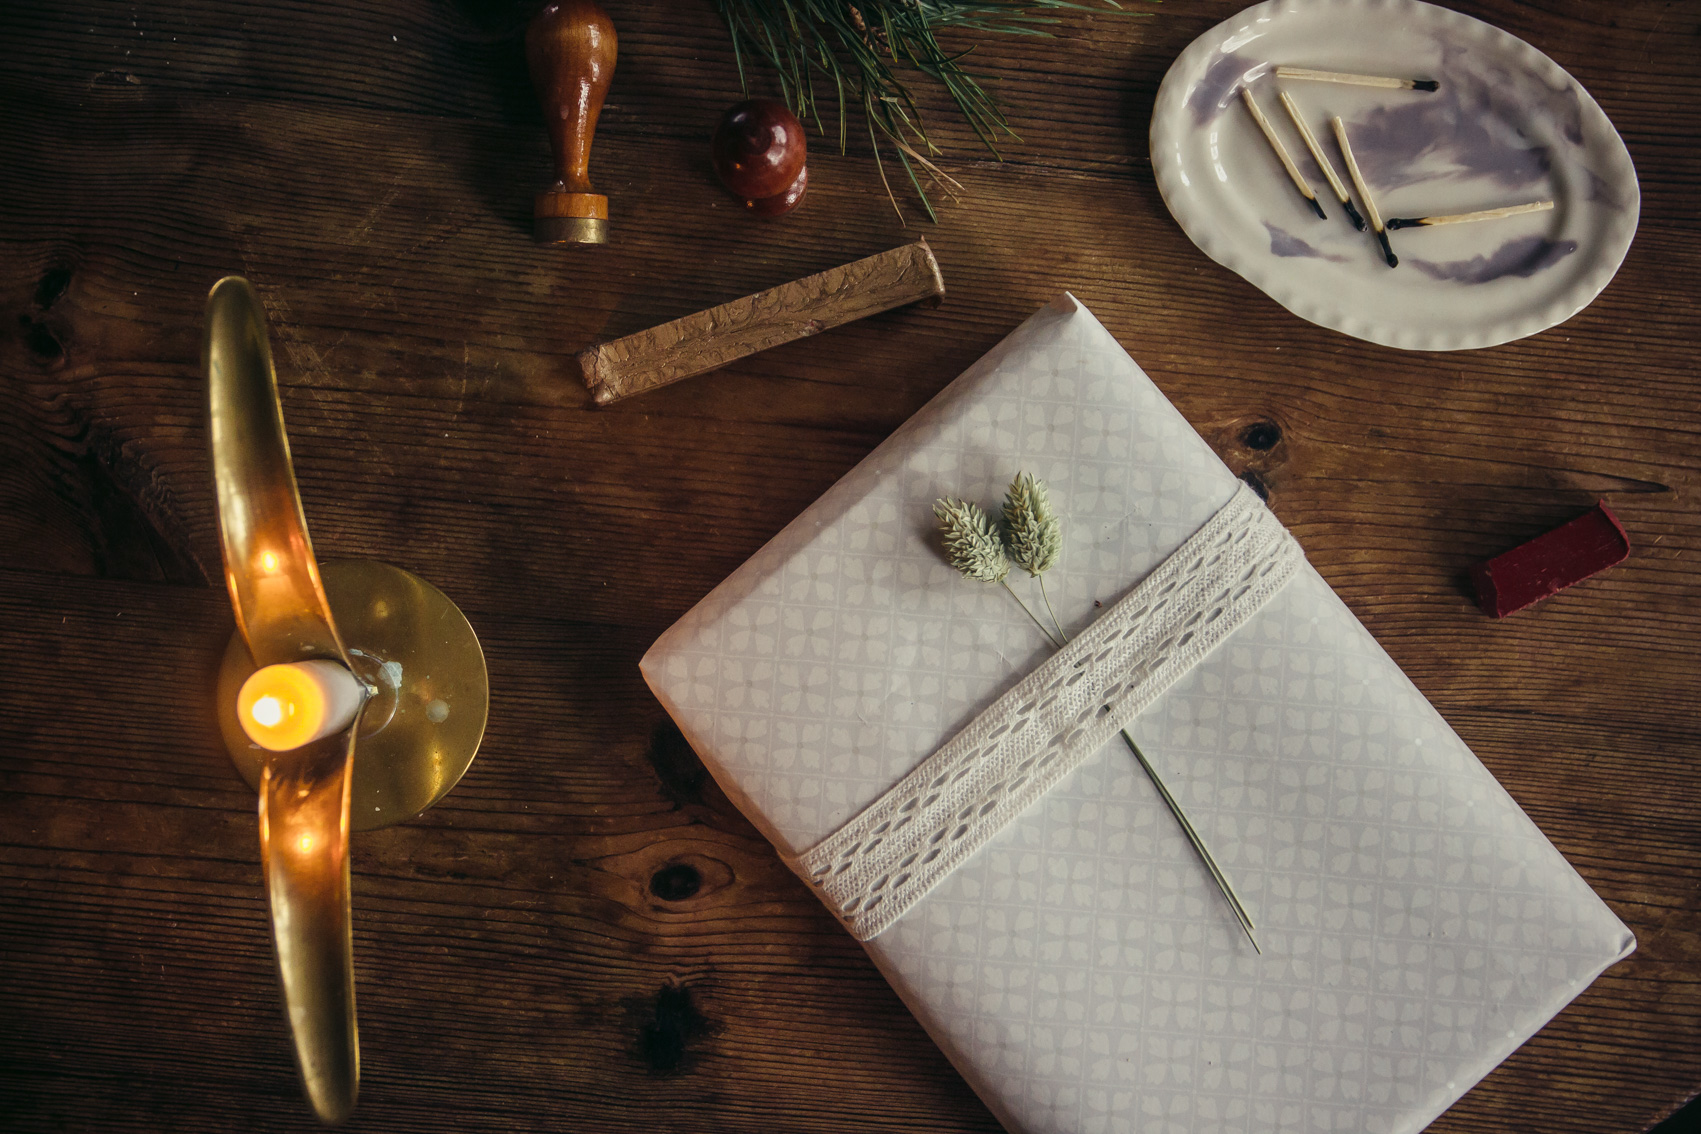 paketinslagning julklapp evert midbec tapeter